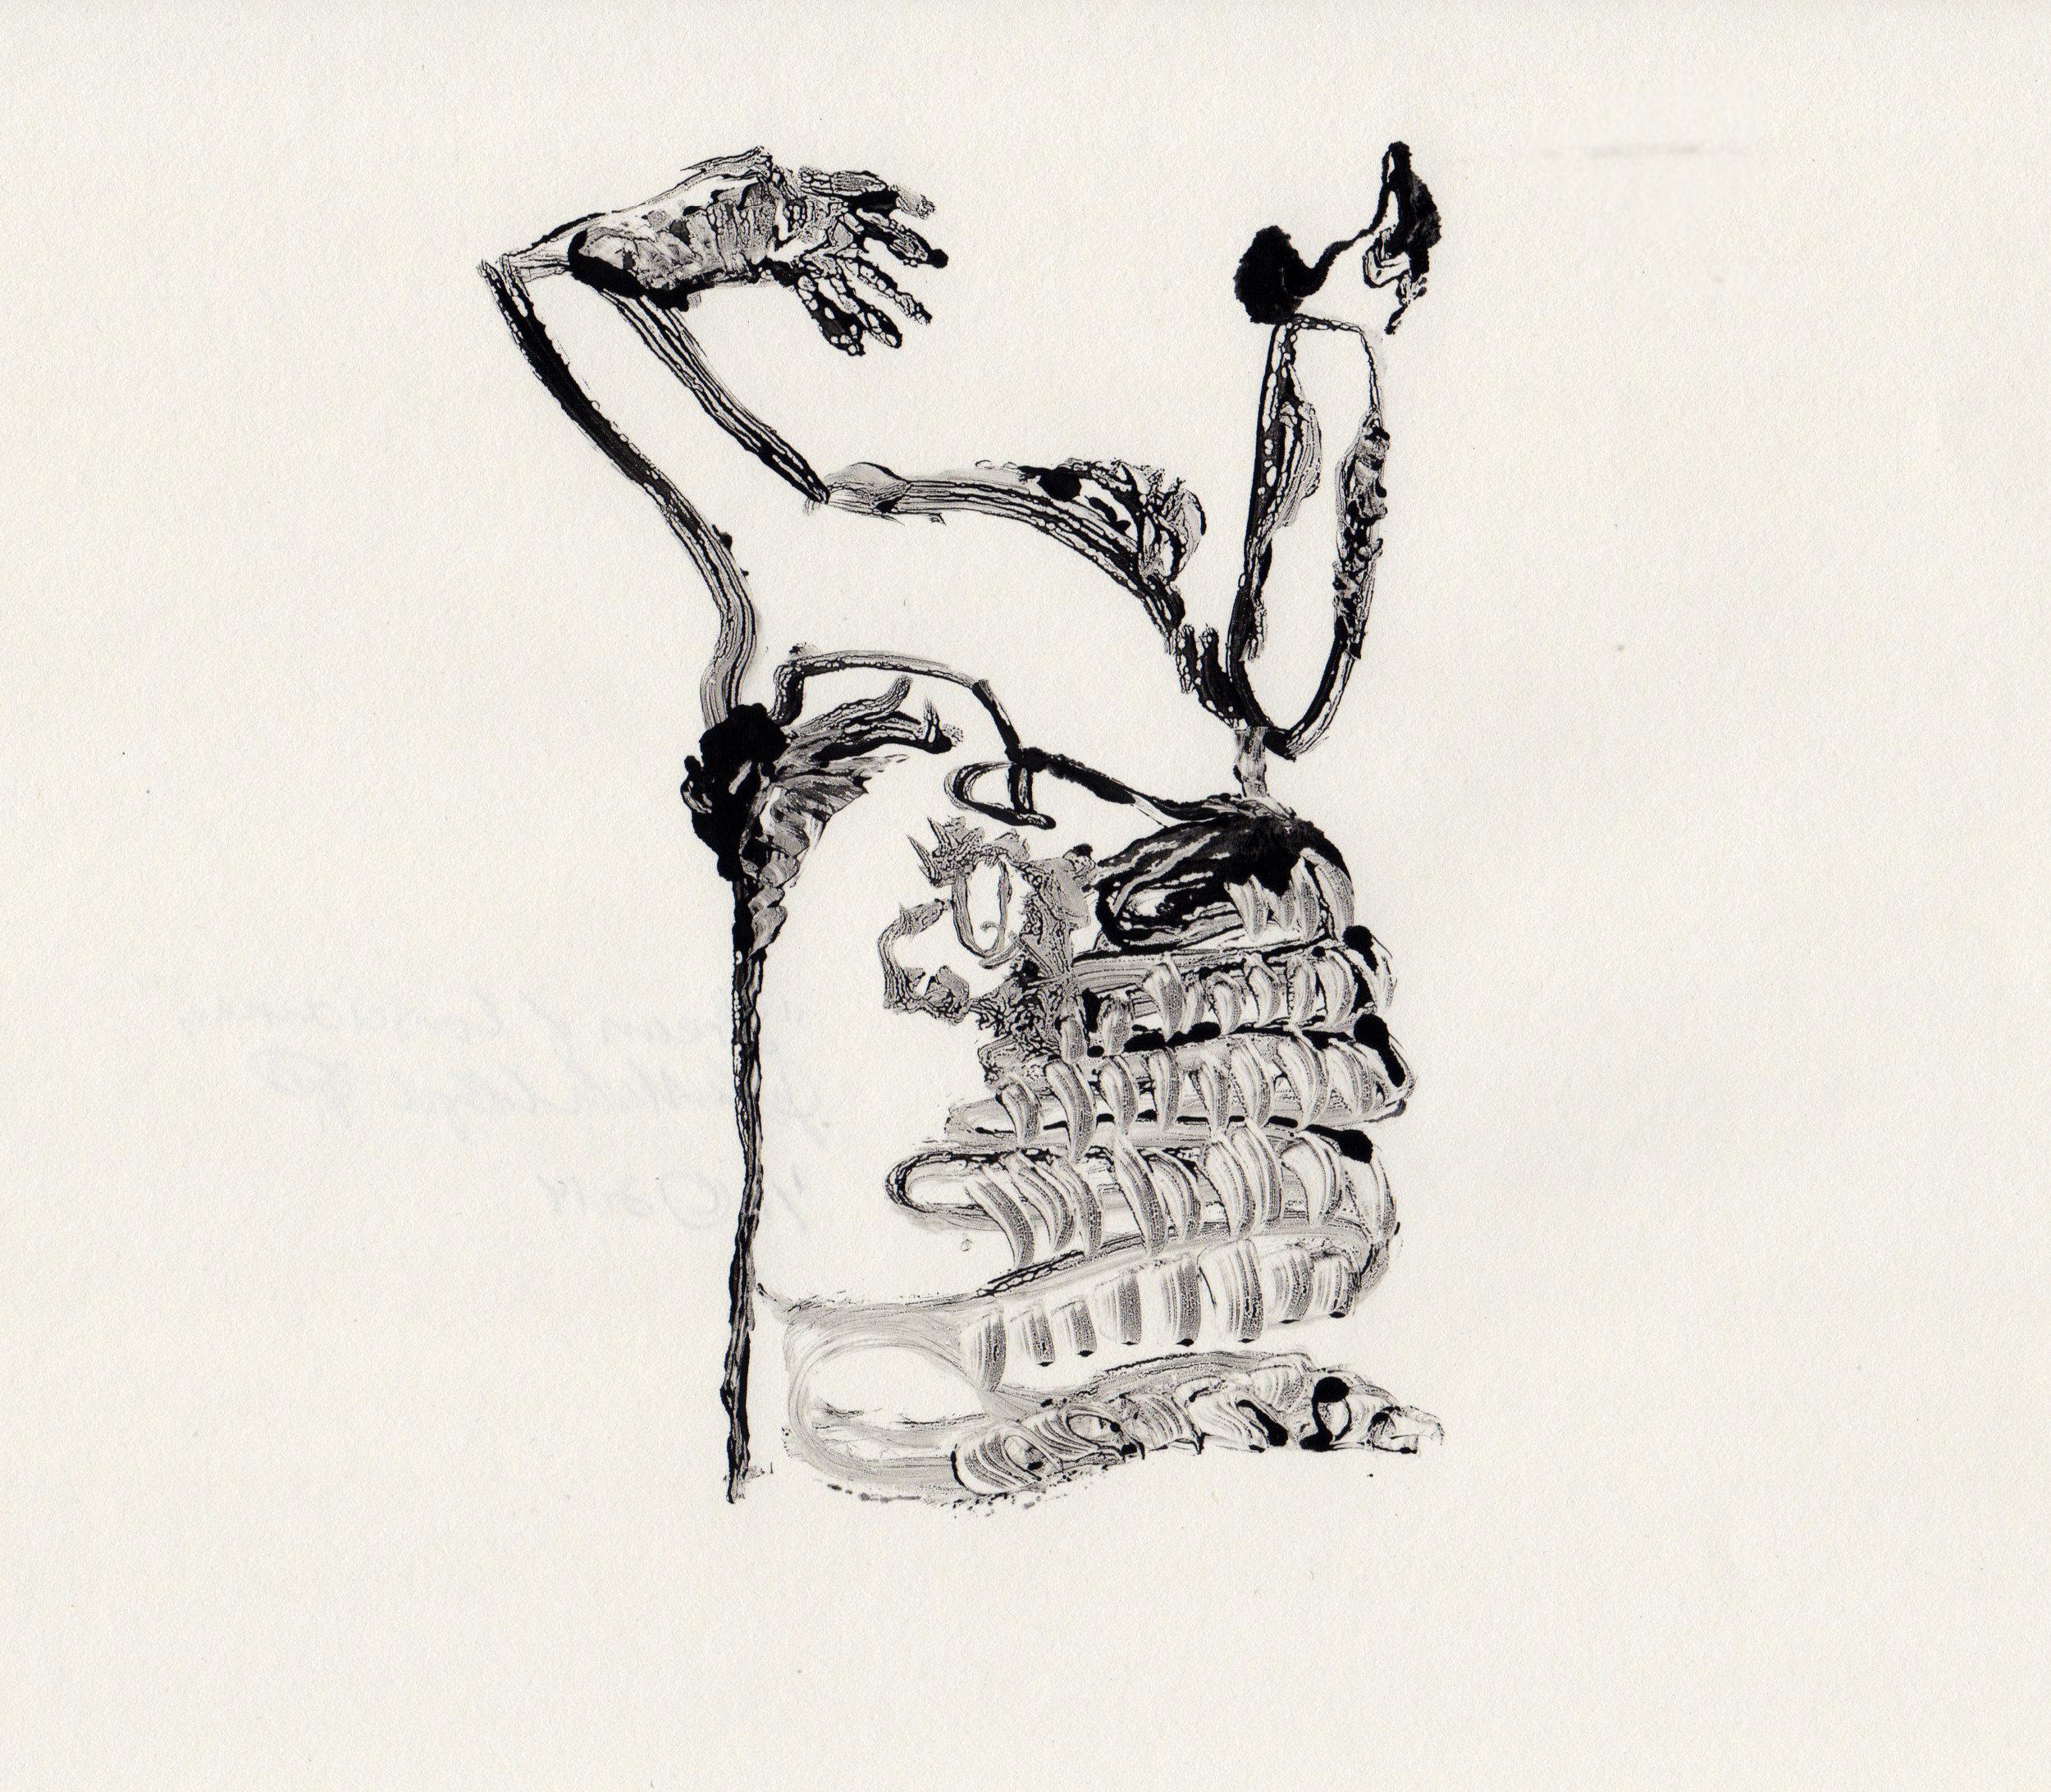 Stream of Consciousness, 2014, gelatin monotype, 10x9 inches